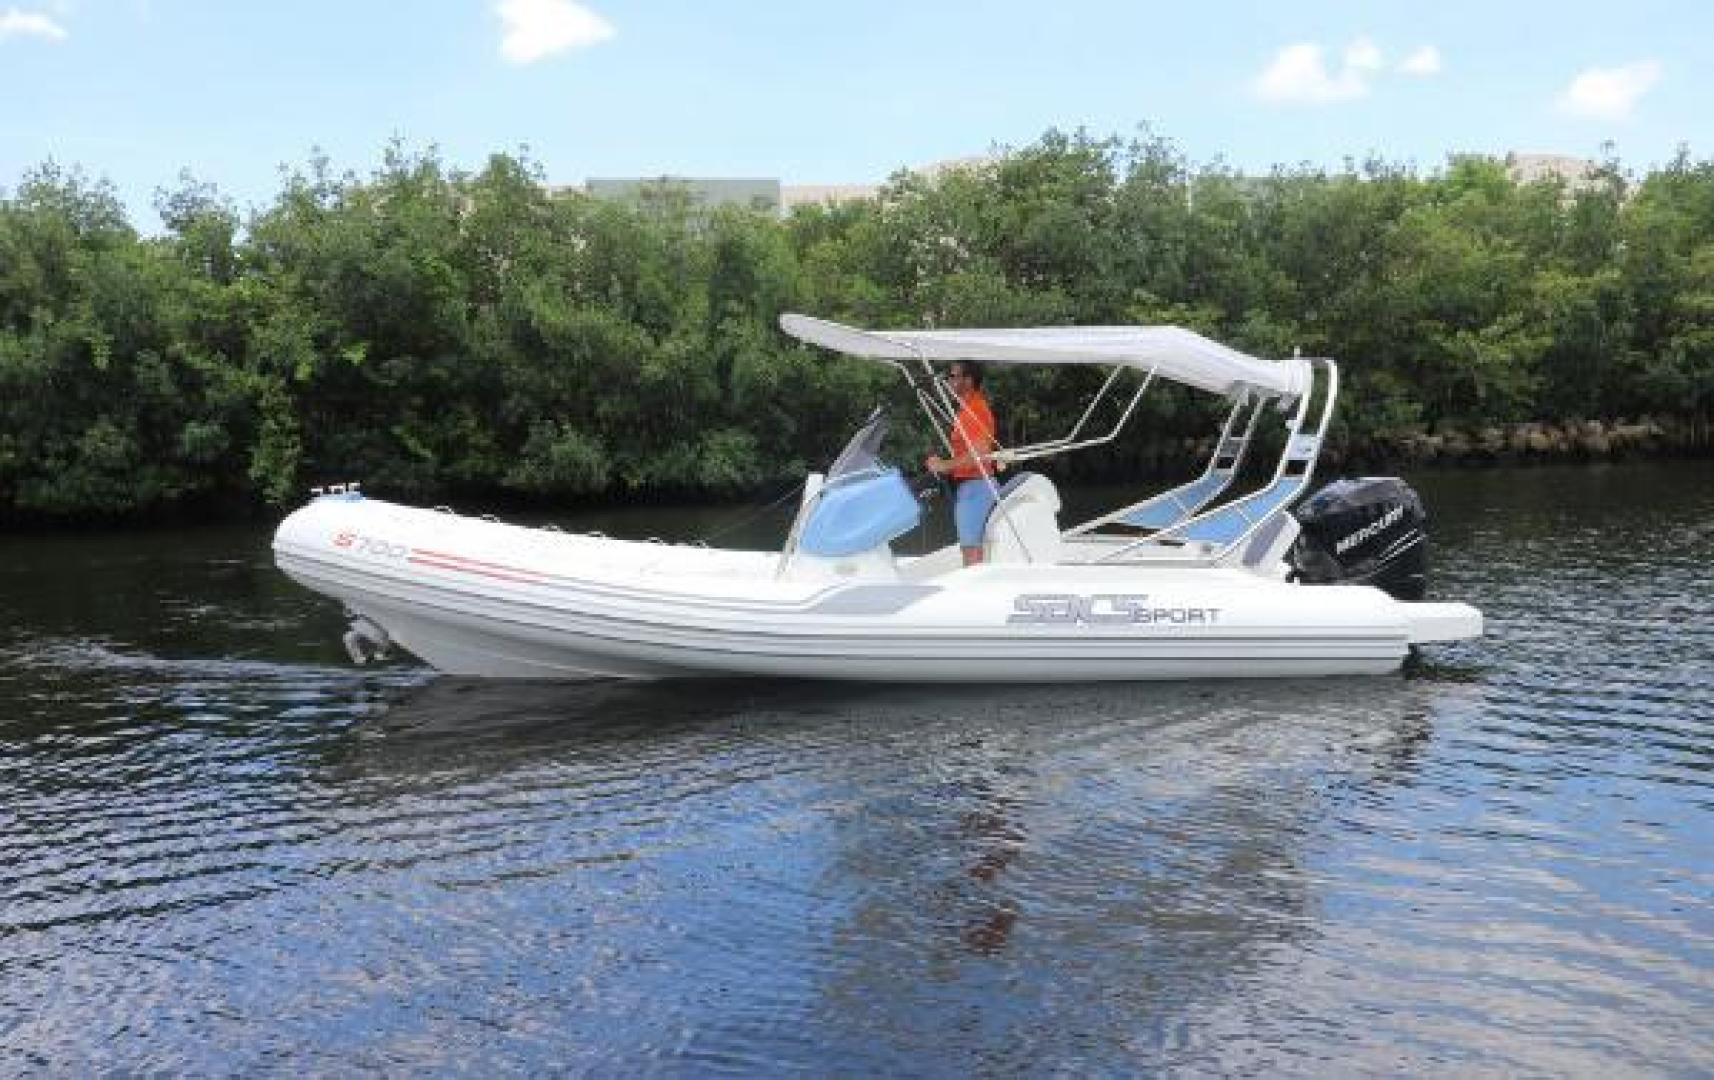 Sacs-Sport 700 2016-Sacs Sport 700 Fort Lauderdale-Florida-United States-1521556 | Thumbnail